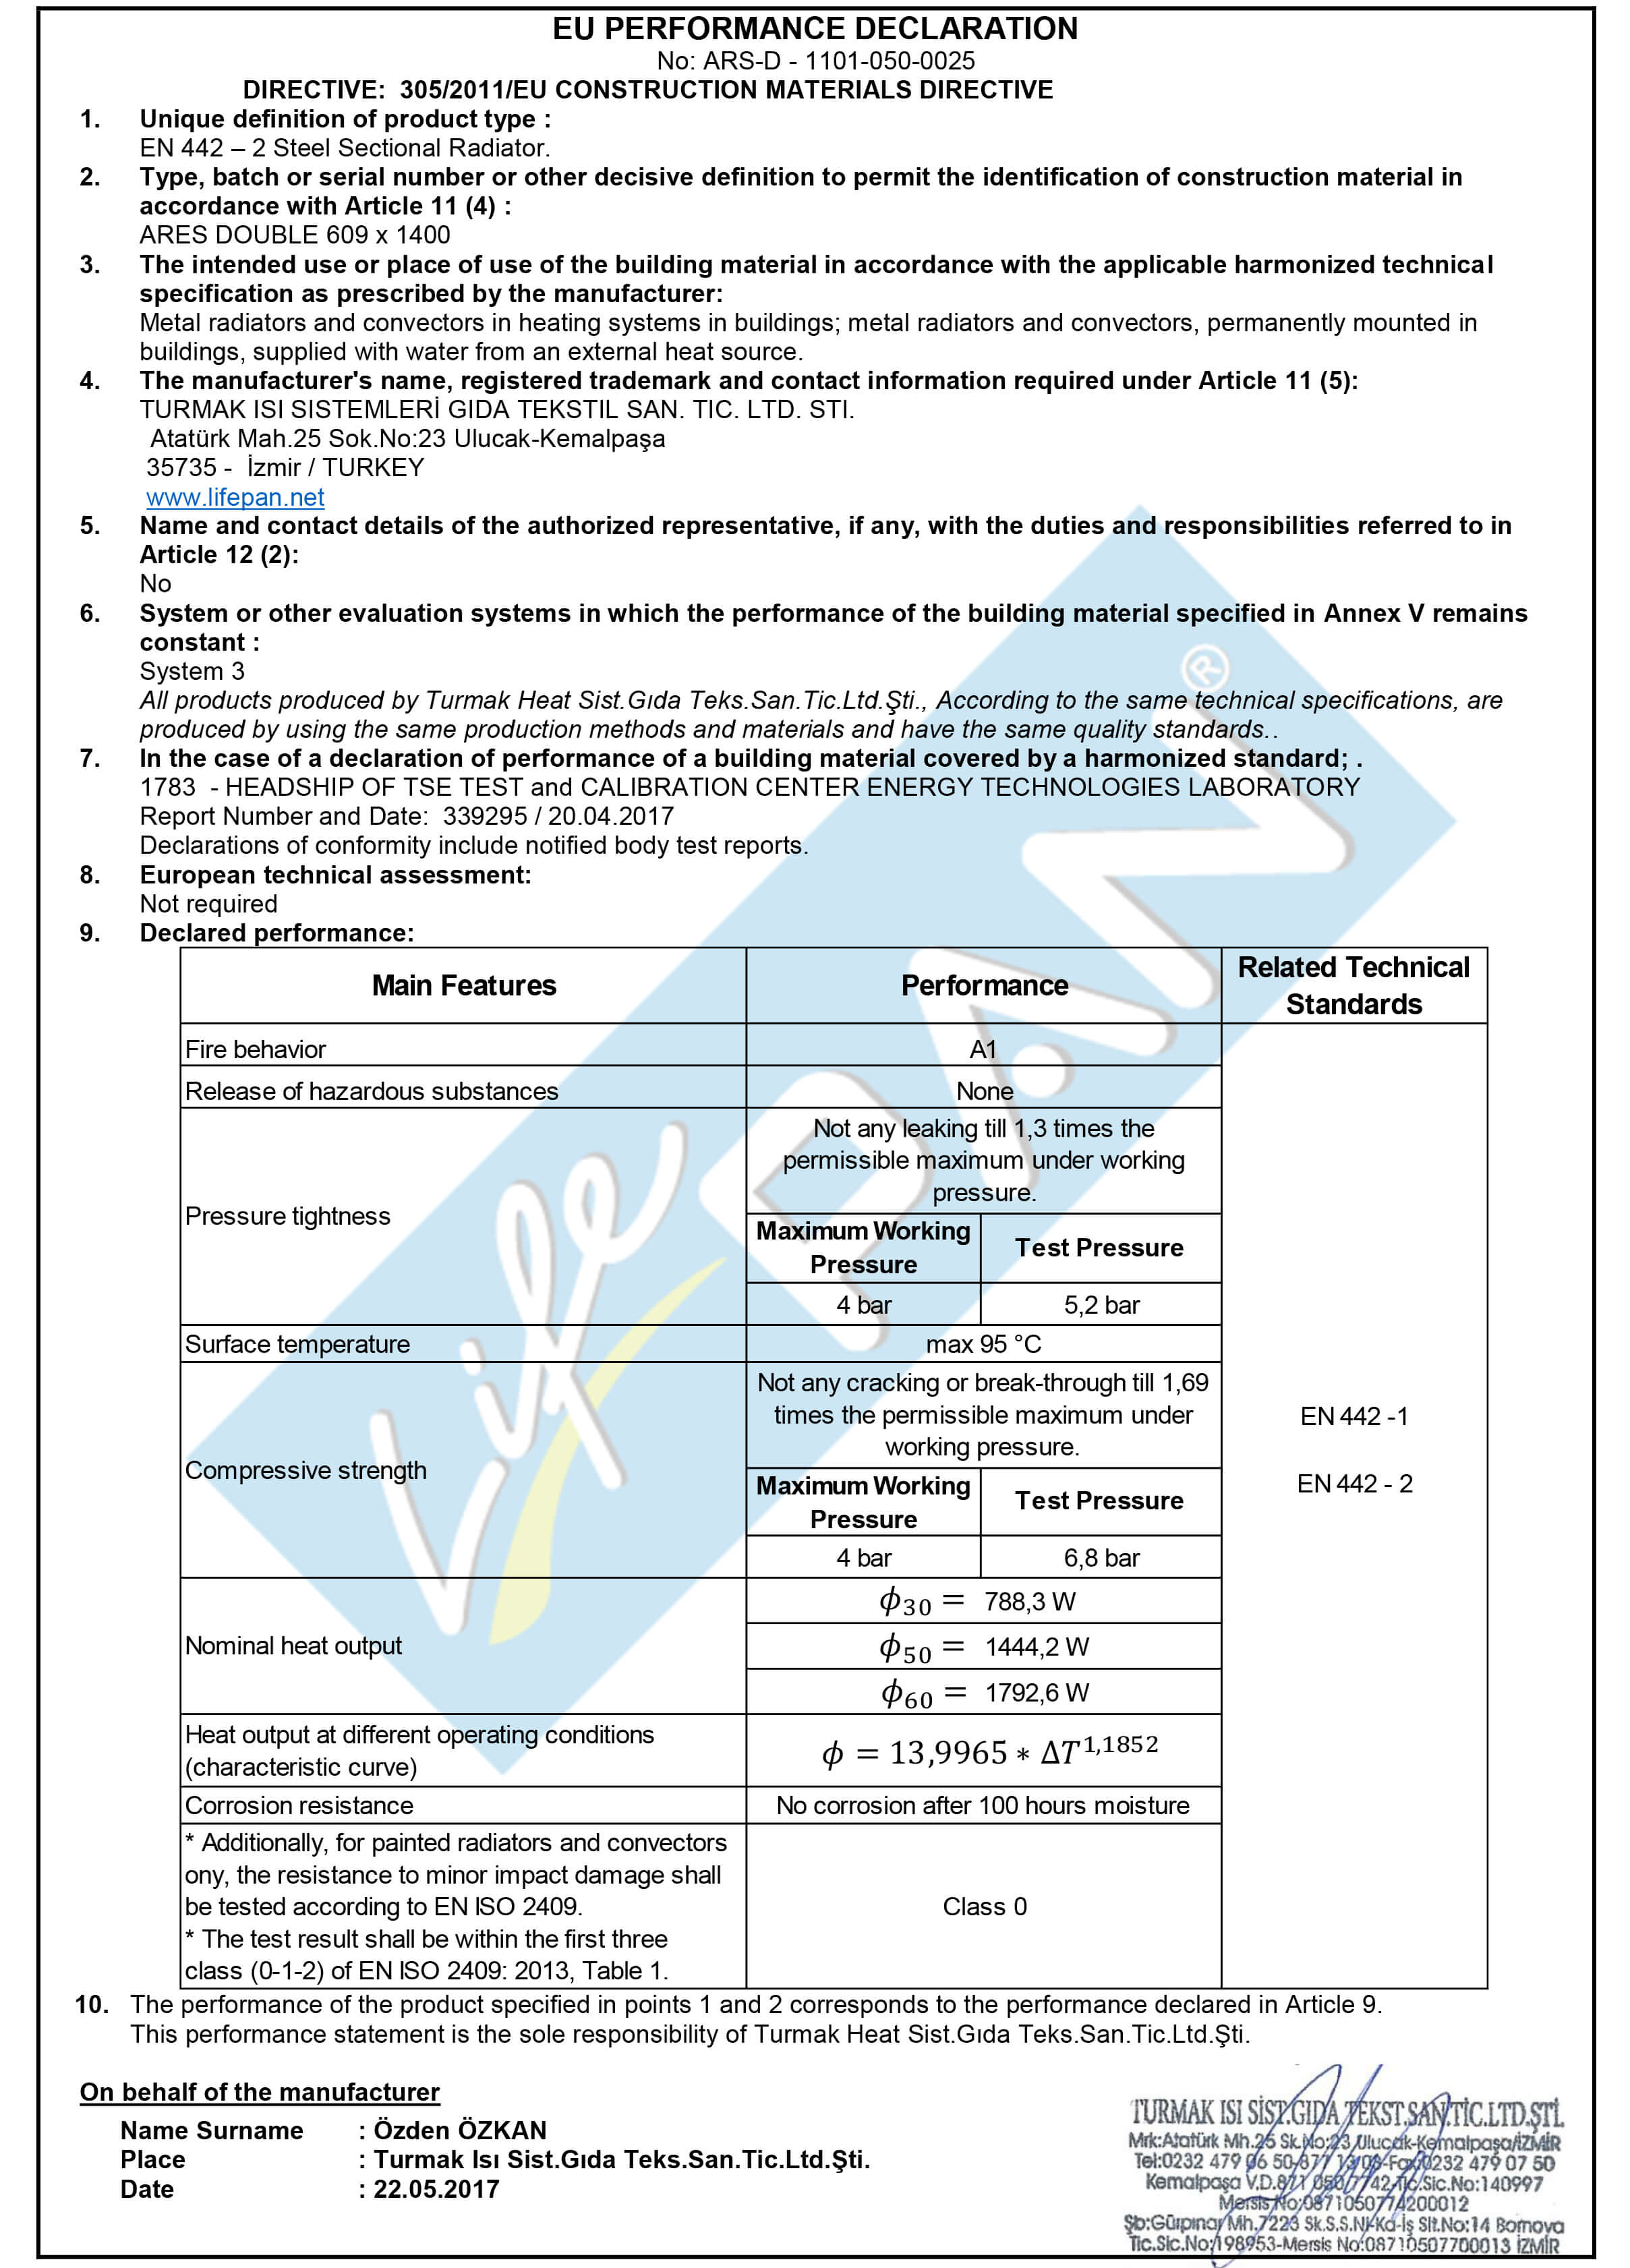 ARES VERTICAL DOUBLE 609x1400 EU PERFORMANCE DECLARATION